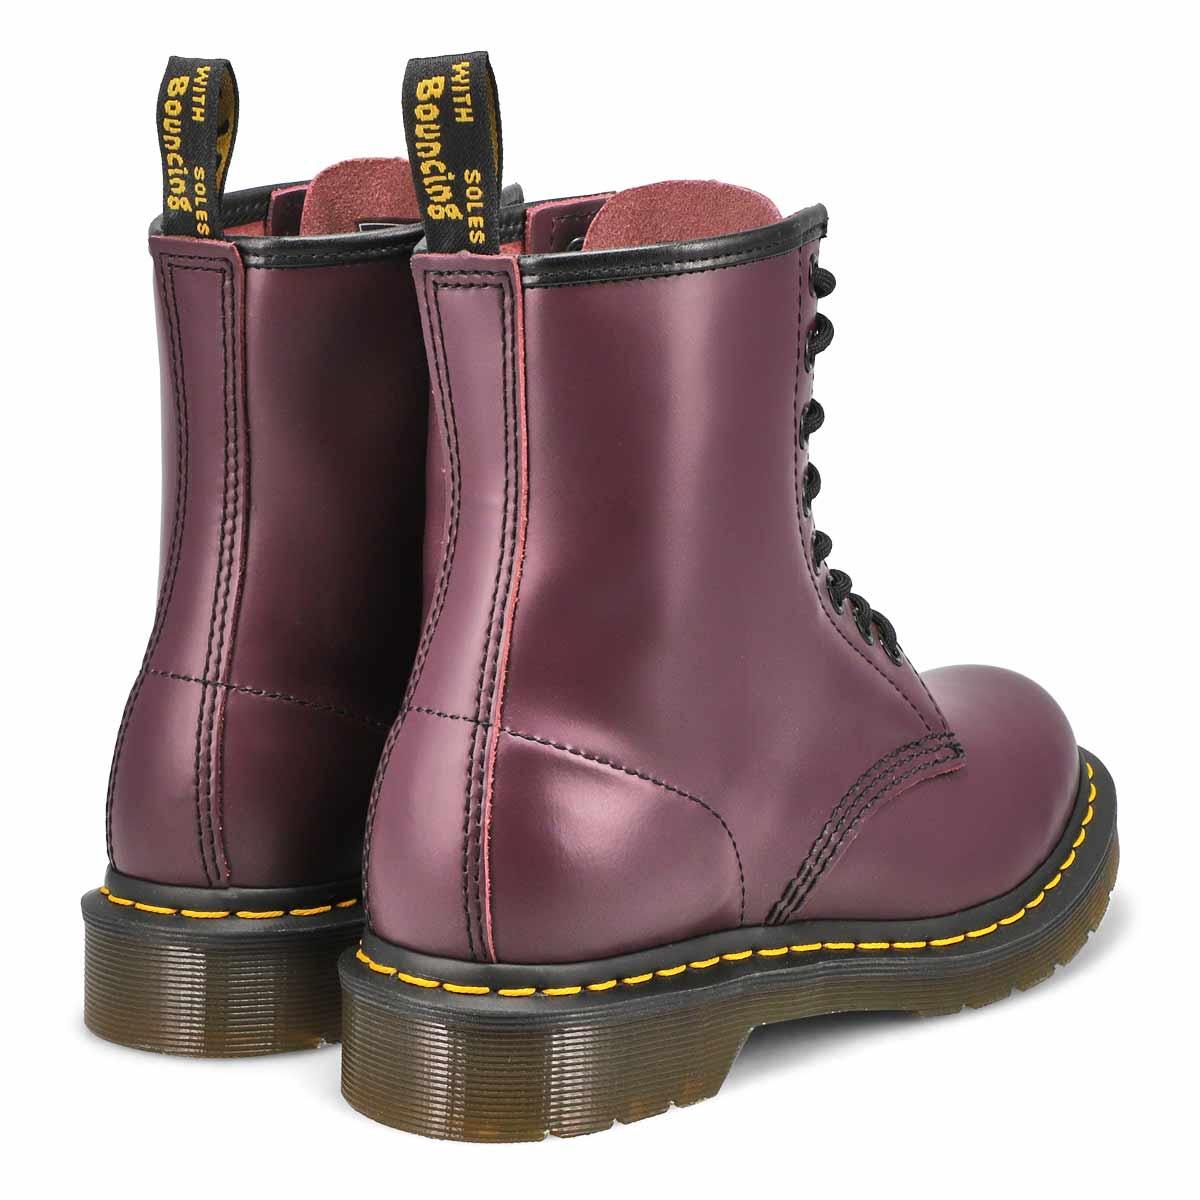 Women's 1460 8-Eye Smooth Leather Boot - Purple